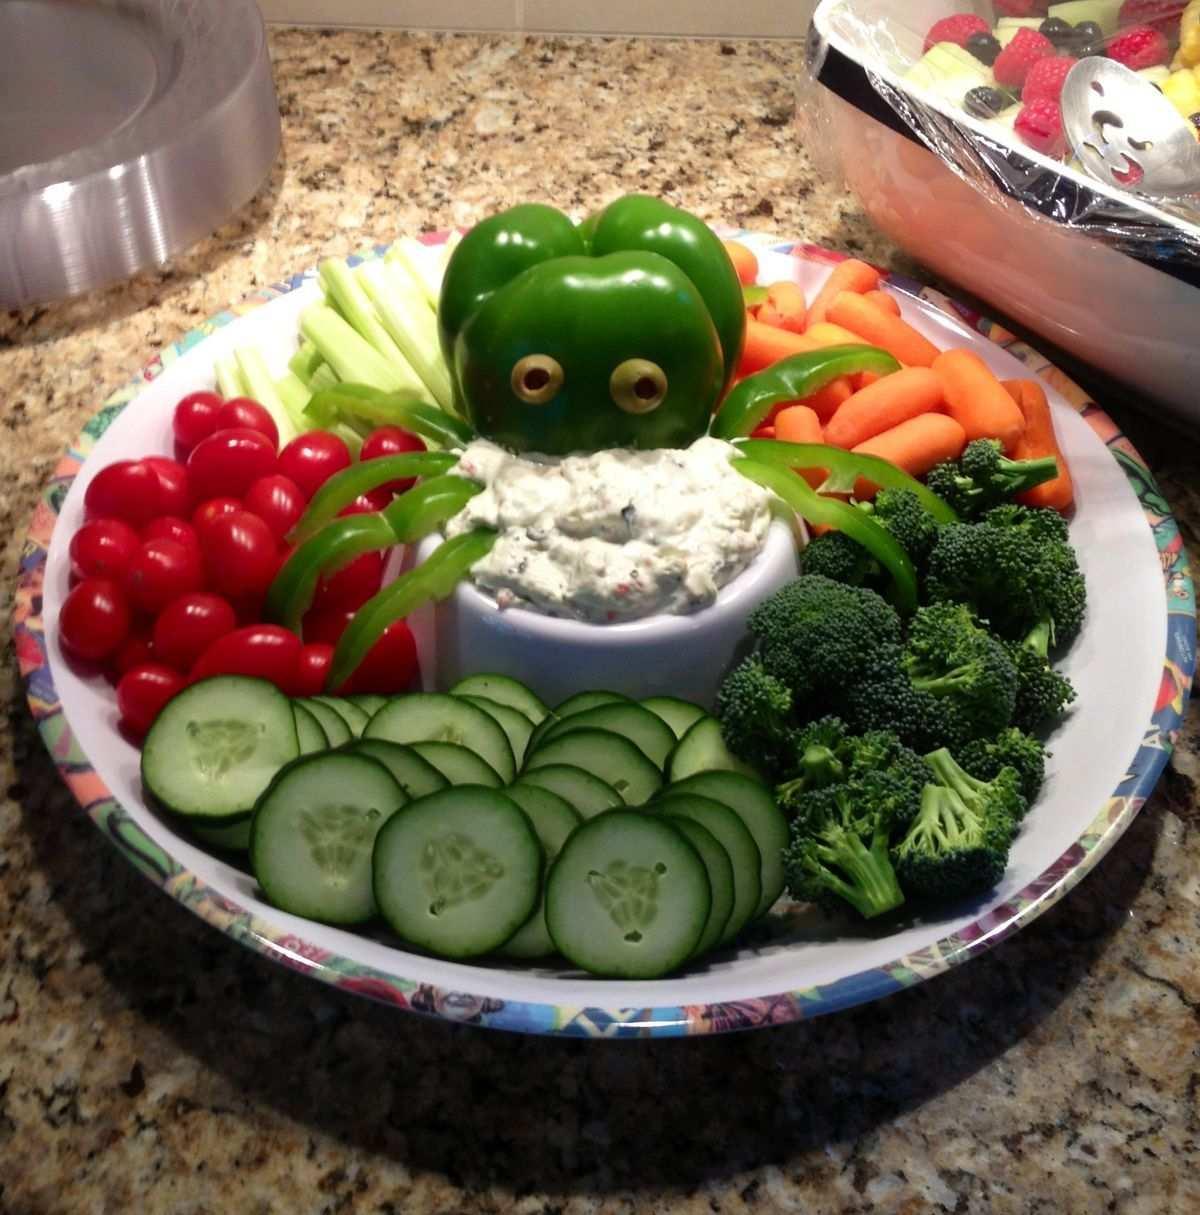 Dc1916417650877e71758c93328b285f Jpg 1 200 1 215 Pixels Beach Birthday Party Vegetable Tray Octonauts Birthday